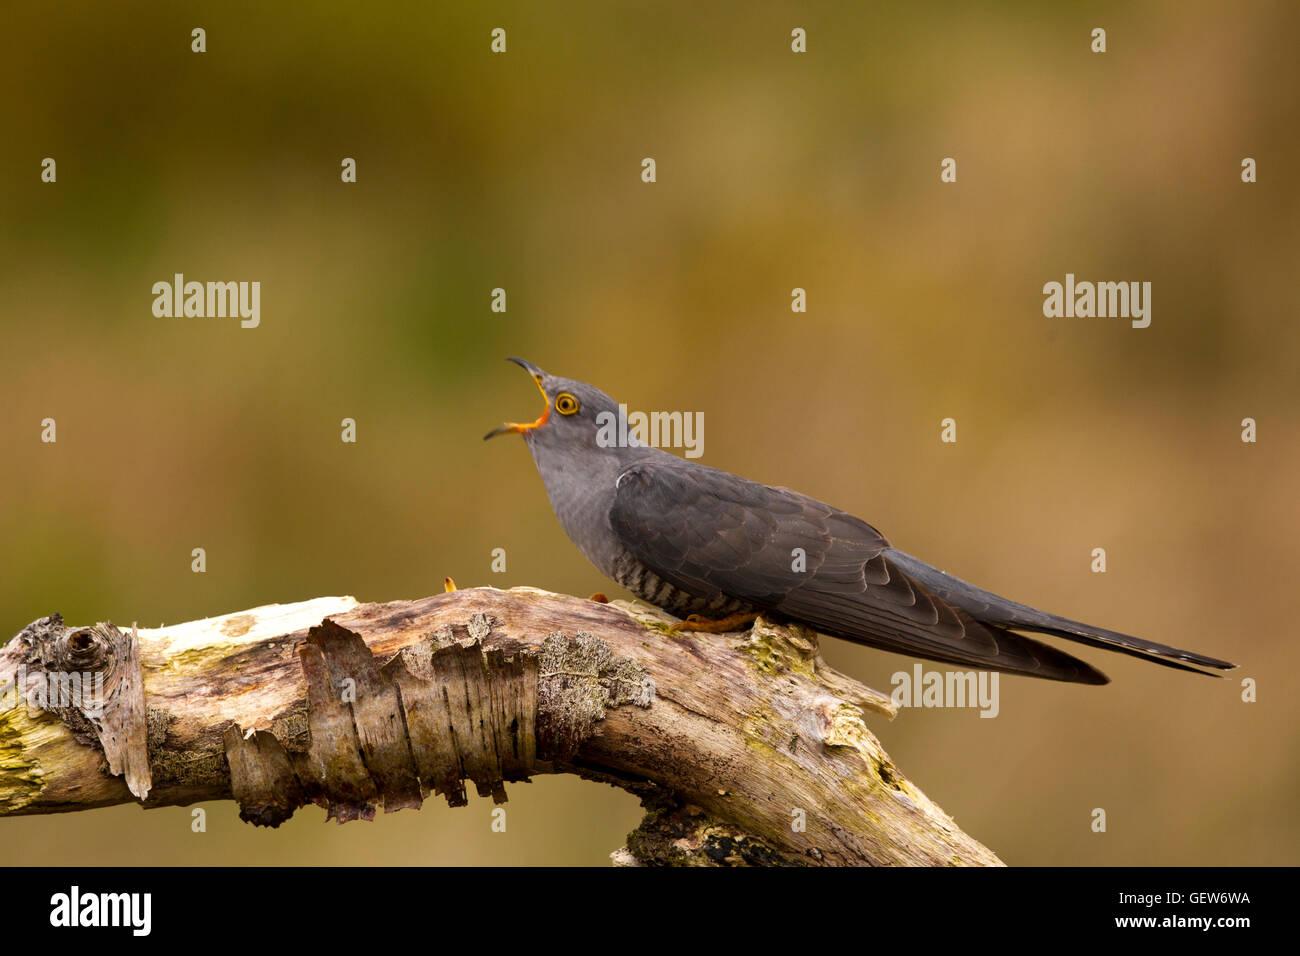 Cuckoo Calling Stock Photo